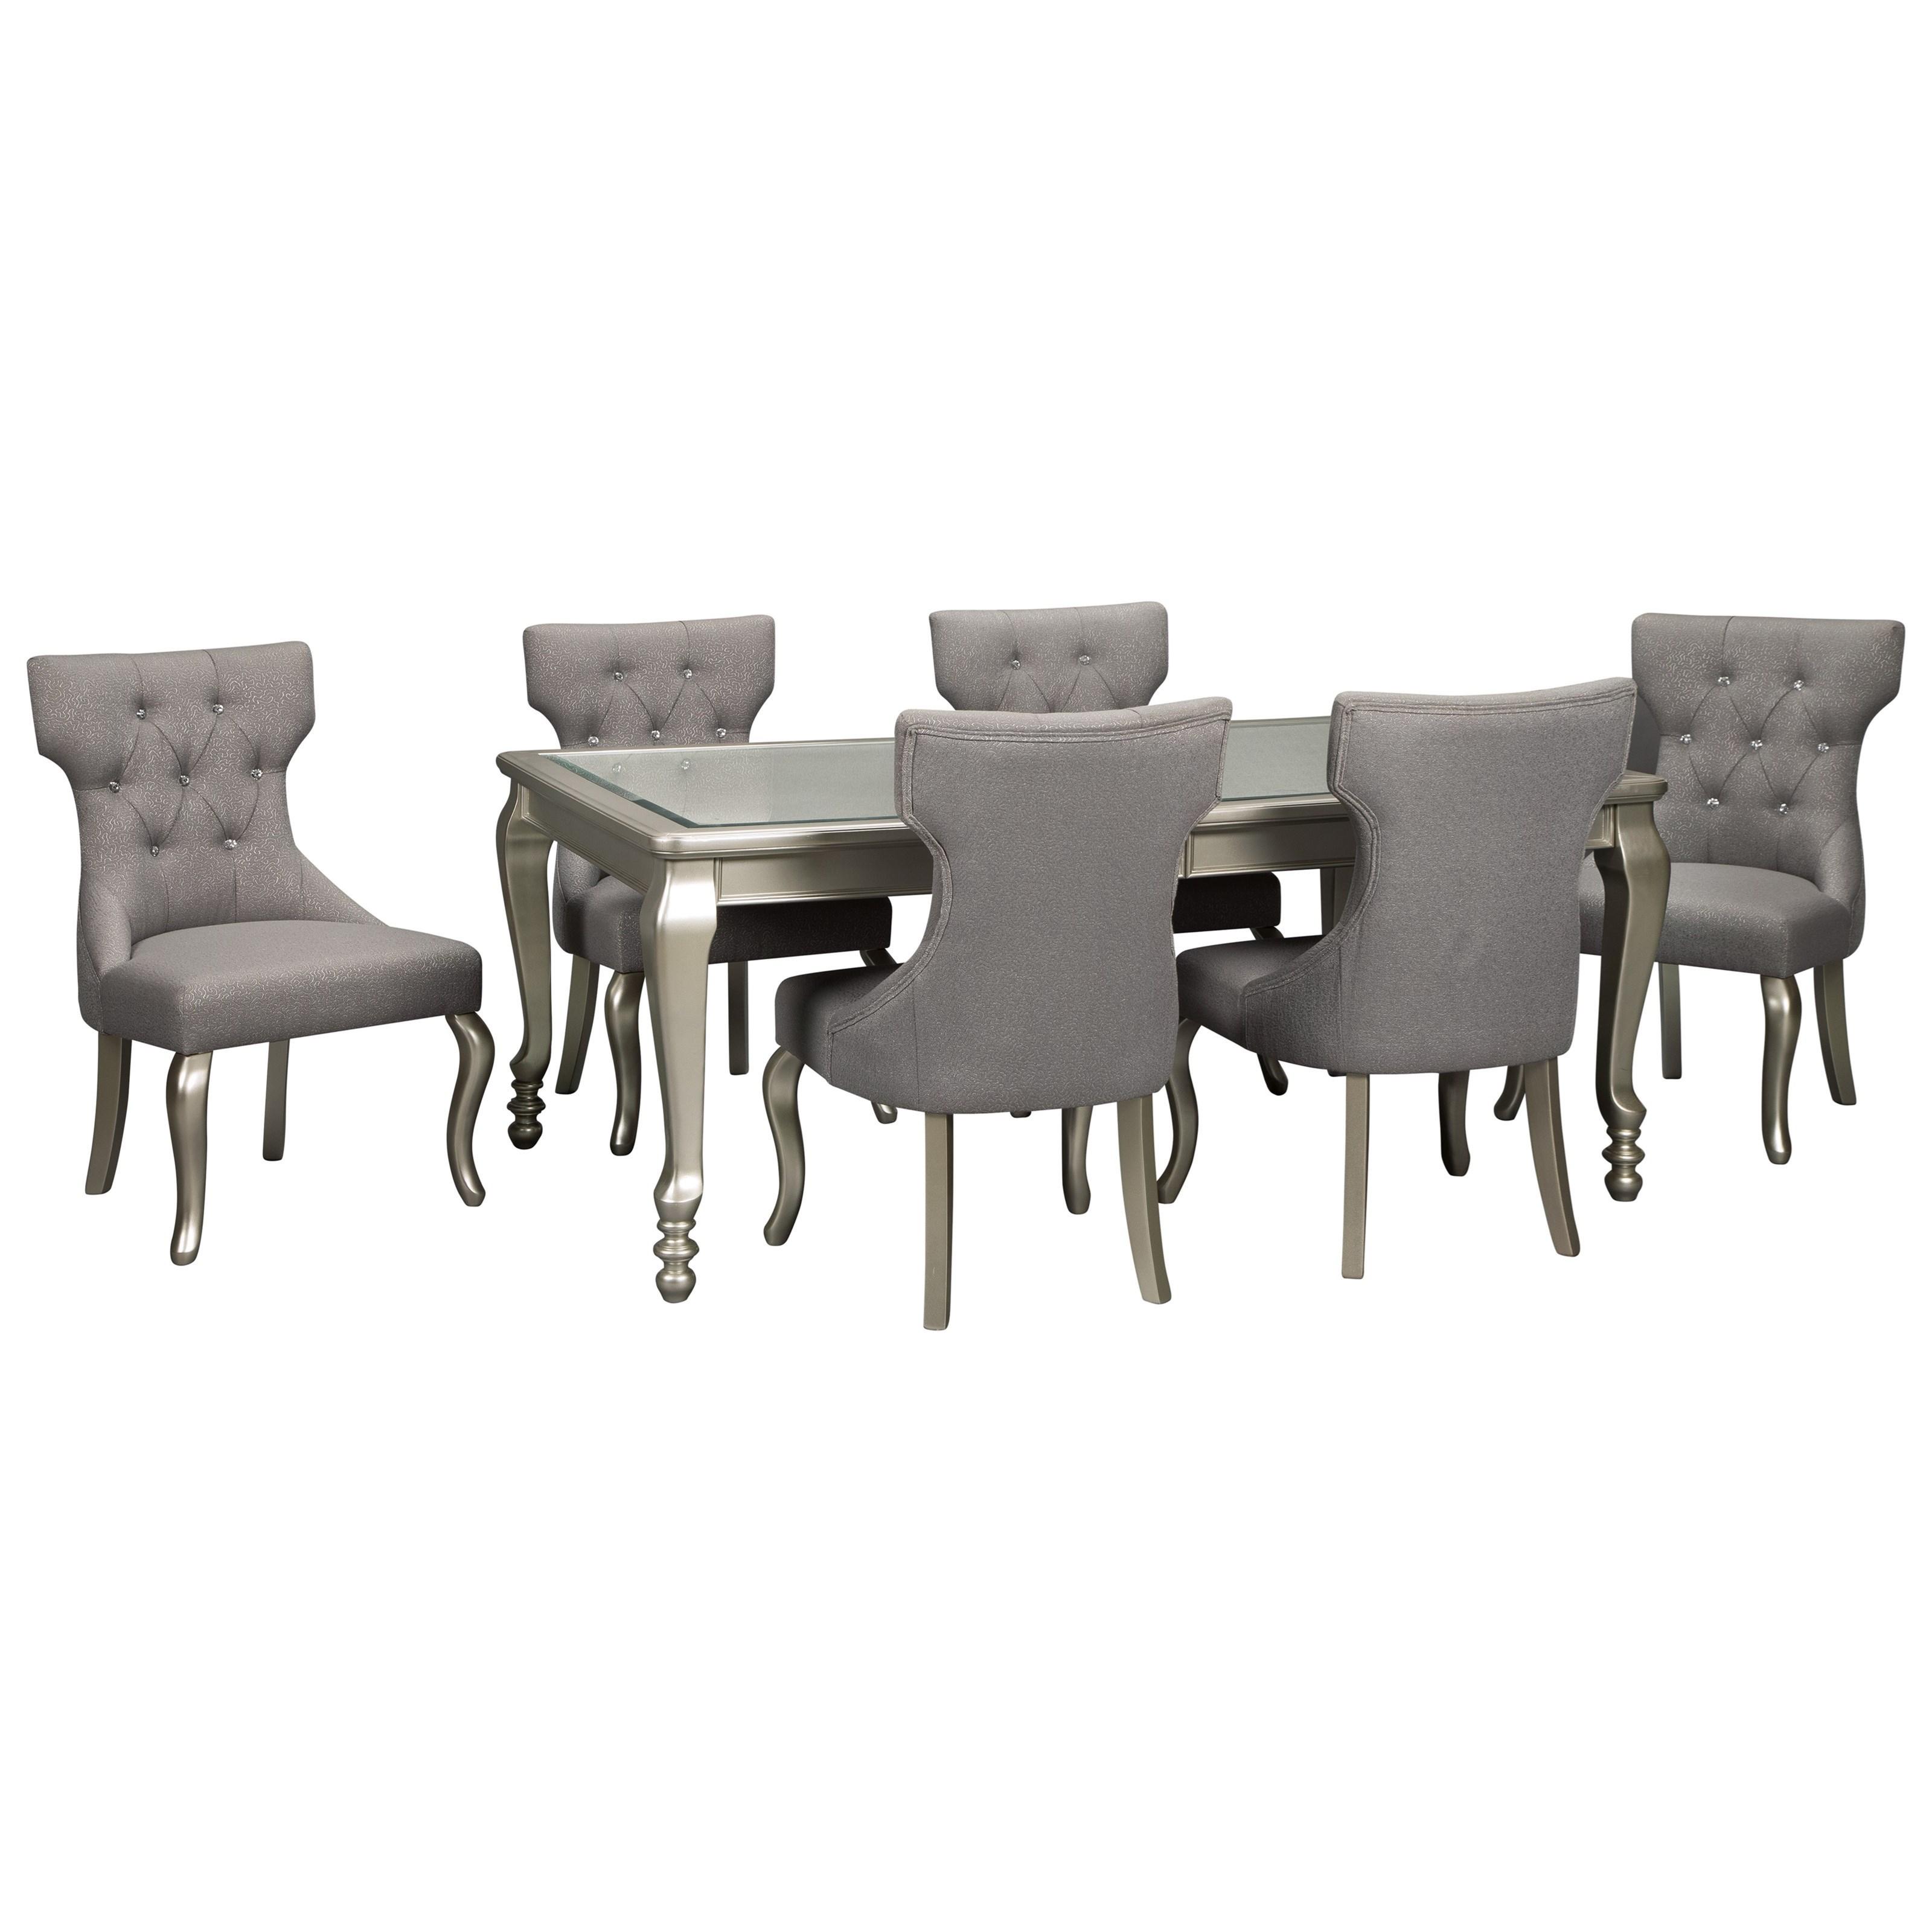 Coralayne 7-Piece Rectangular Dining Room Table Set by Ashley (Signature Design) at Johnny Janosik